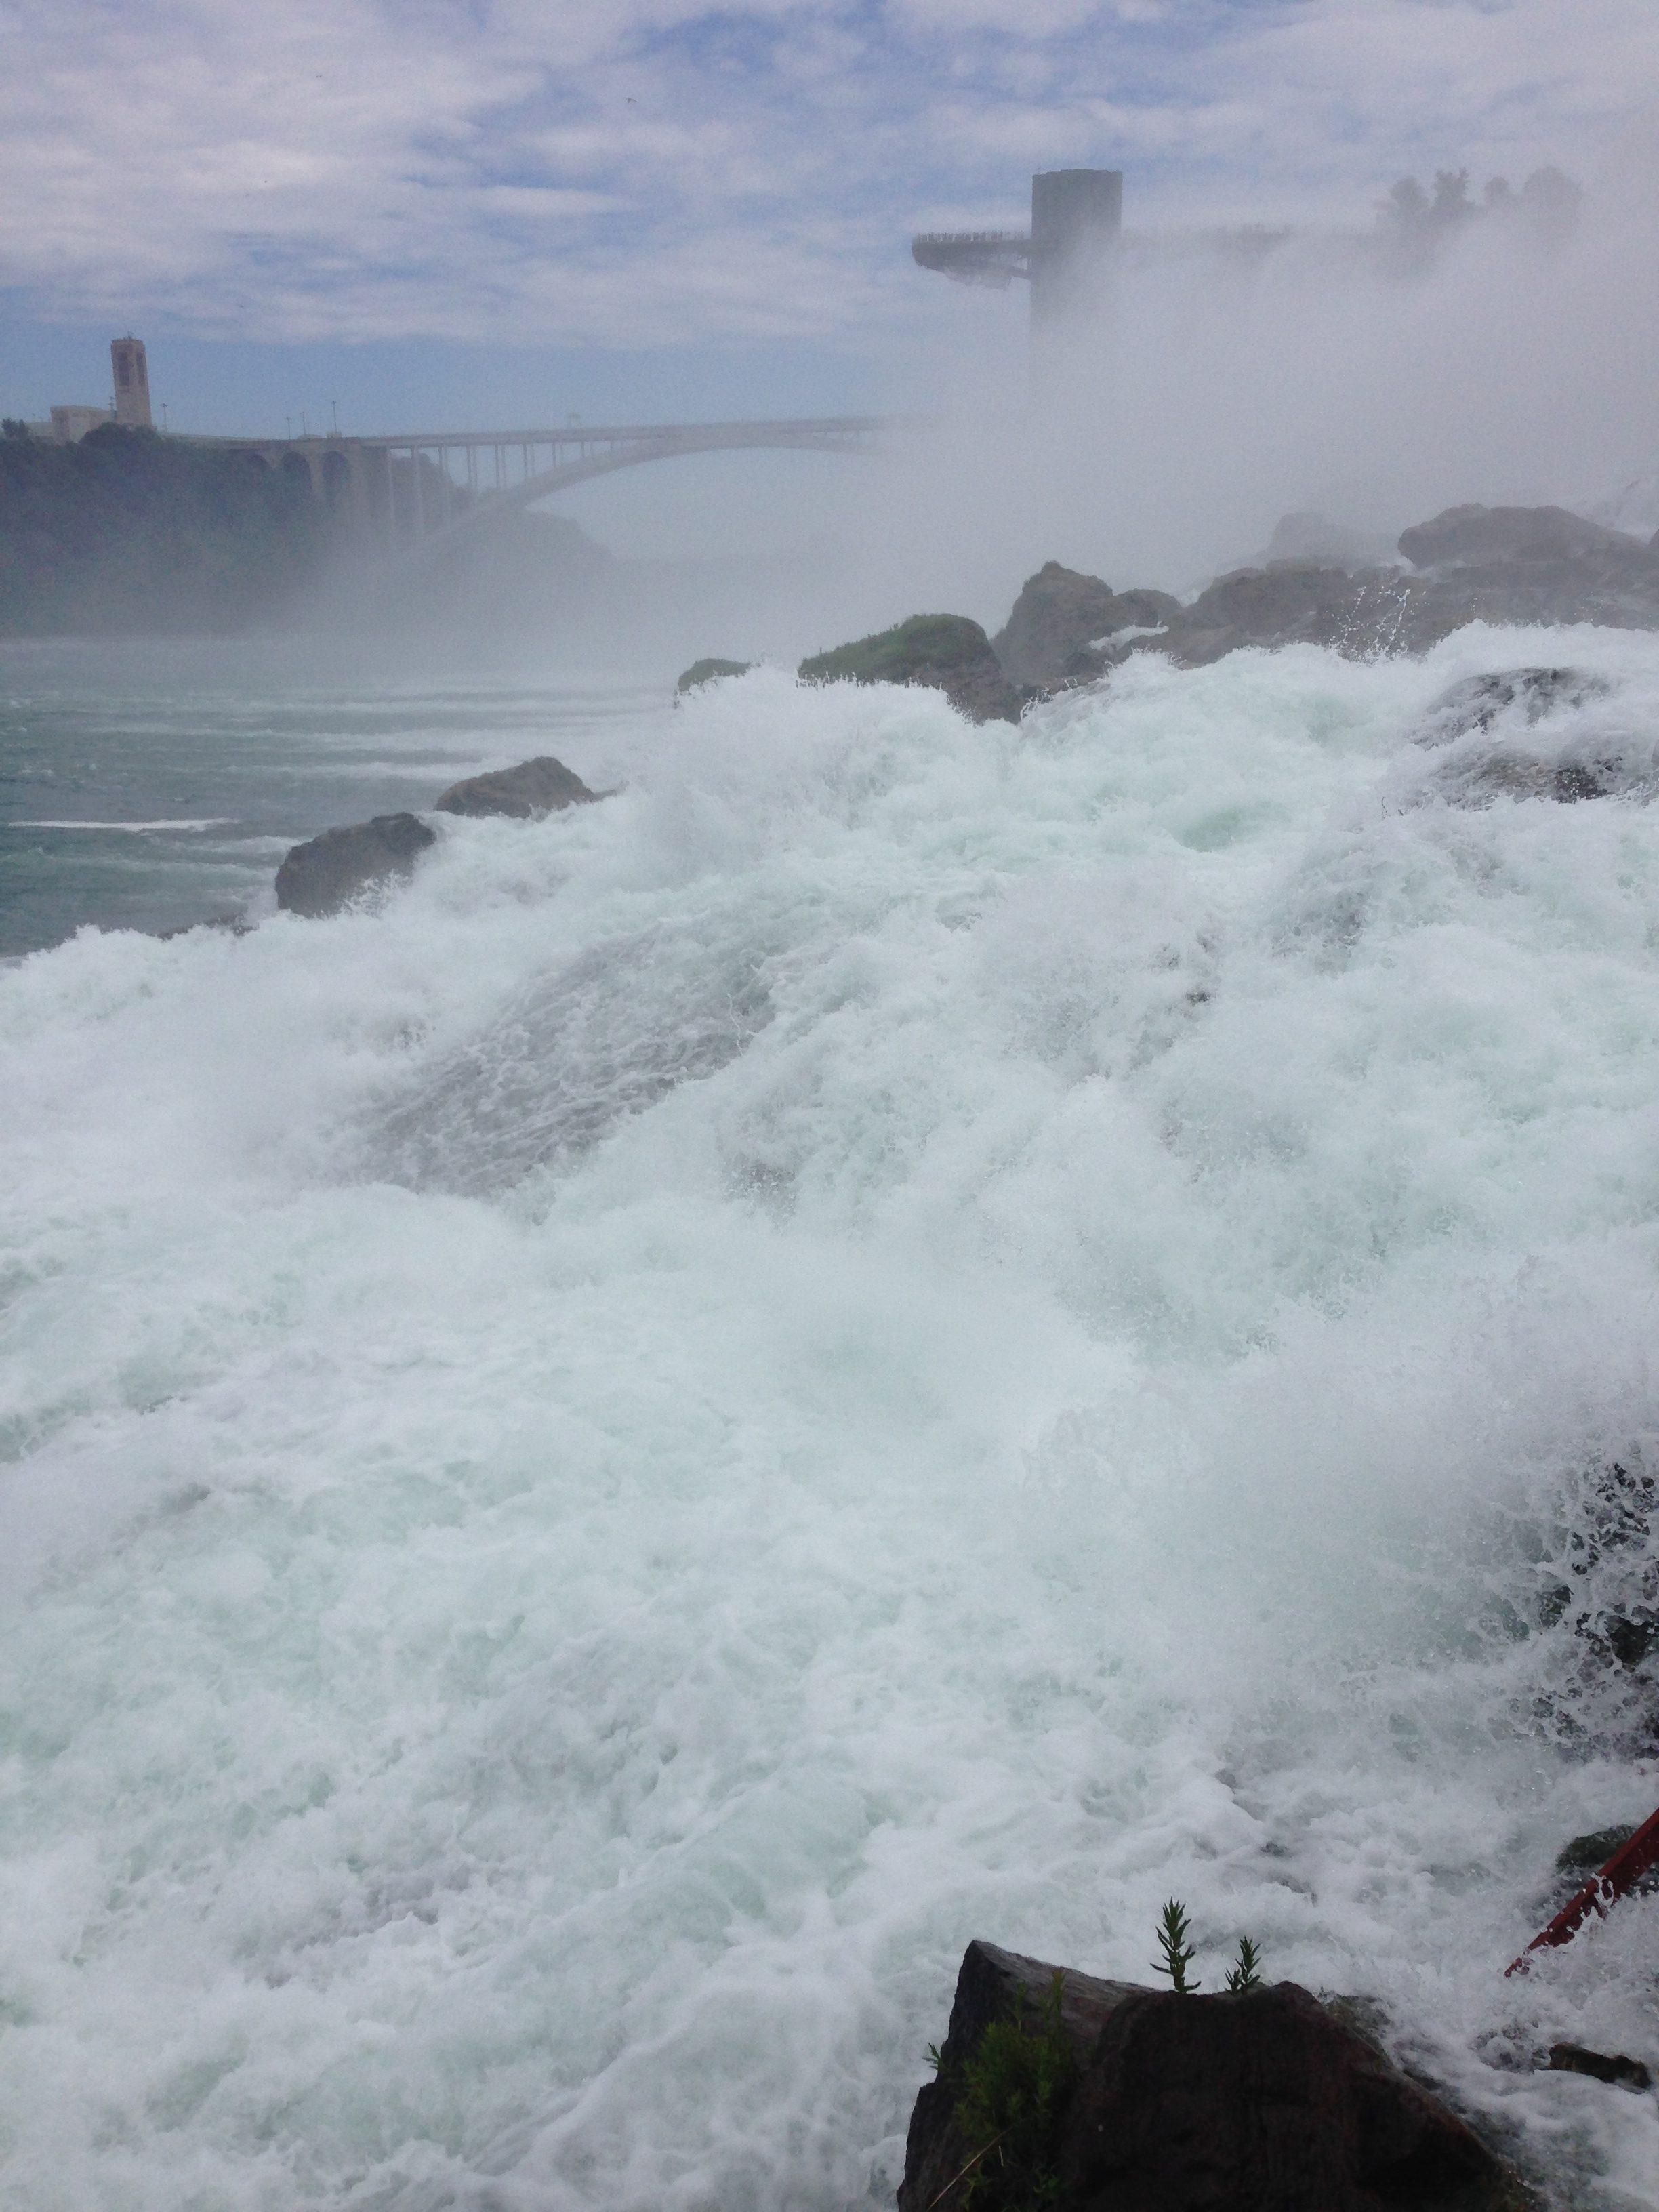 A Weekend in Niagara Falls